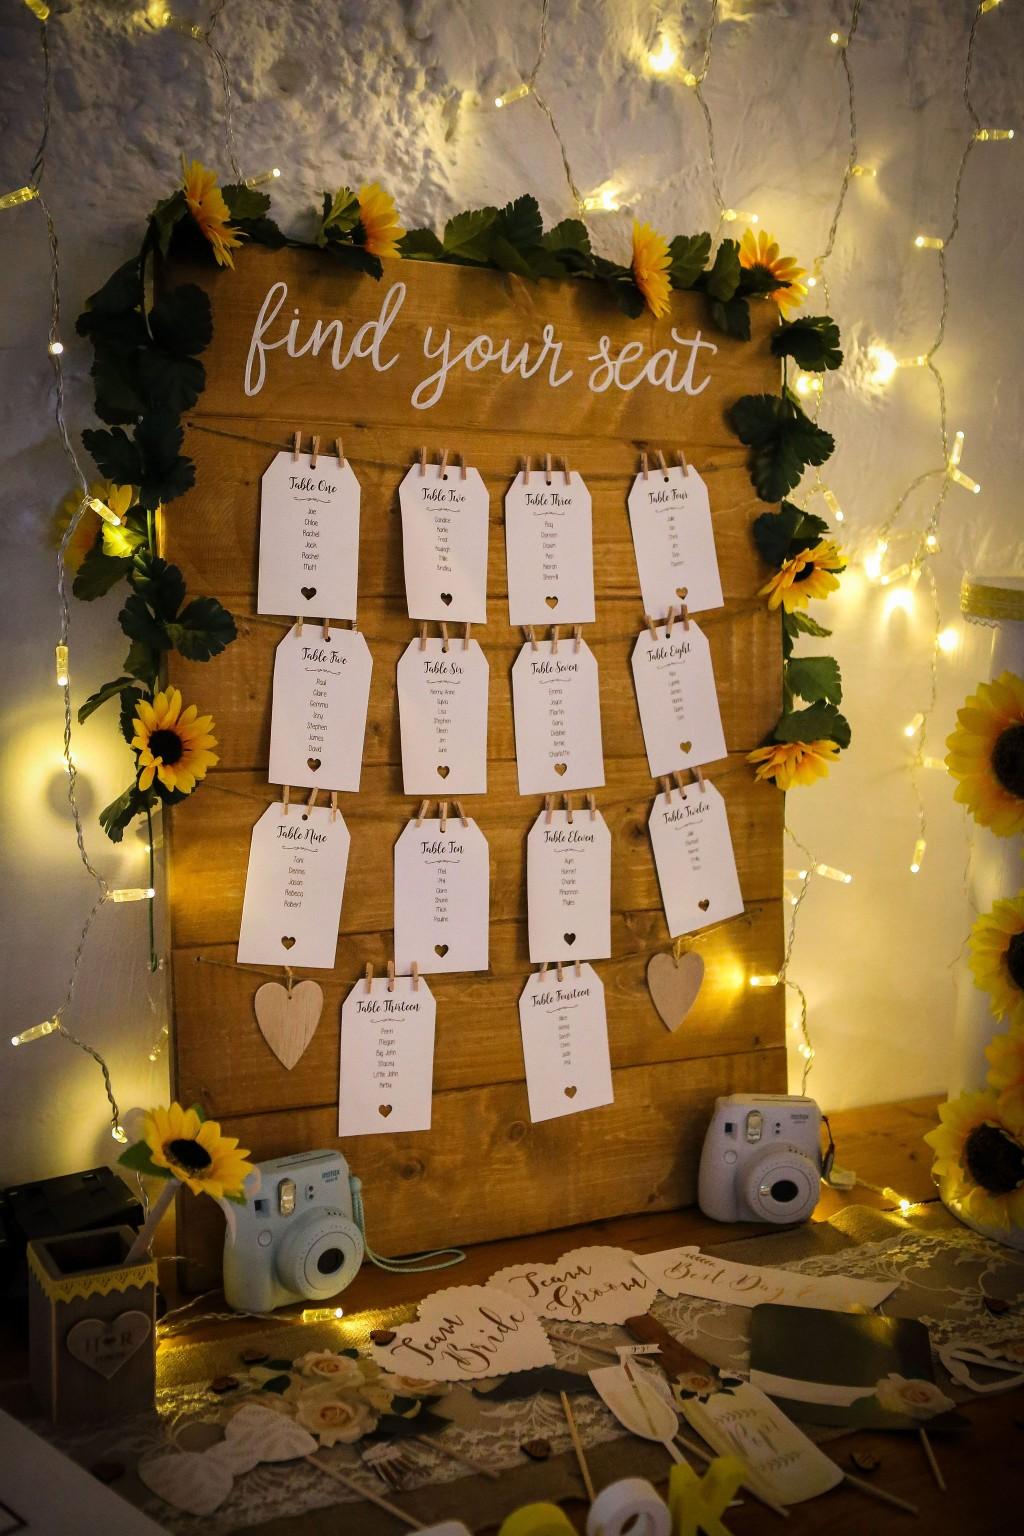 Harriet&Rhys Wedding - Magical sunflower wedding - sunflower seating plan